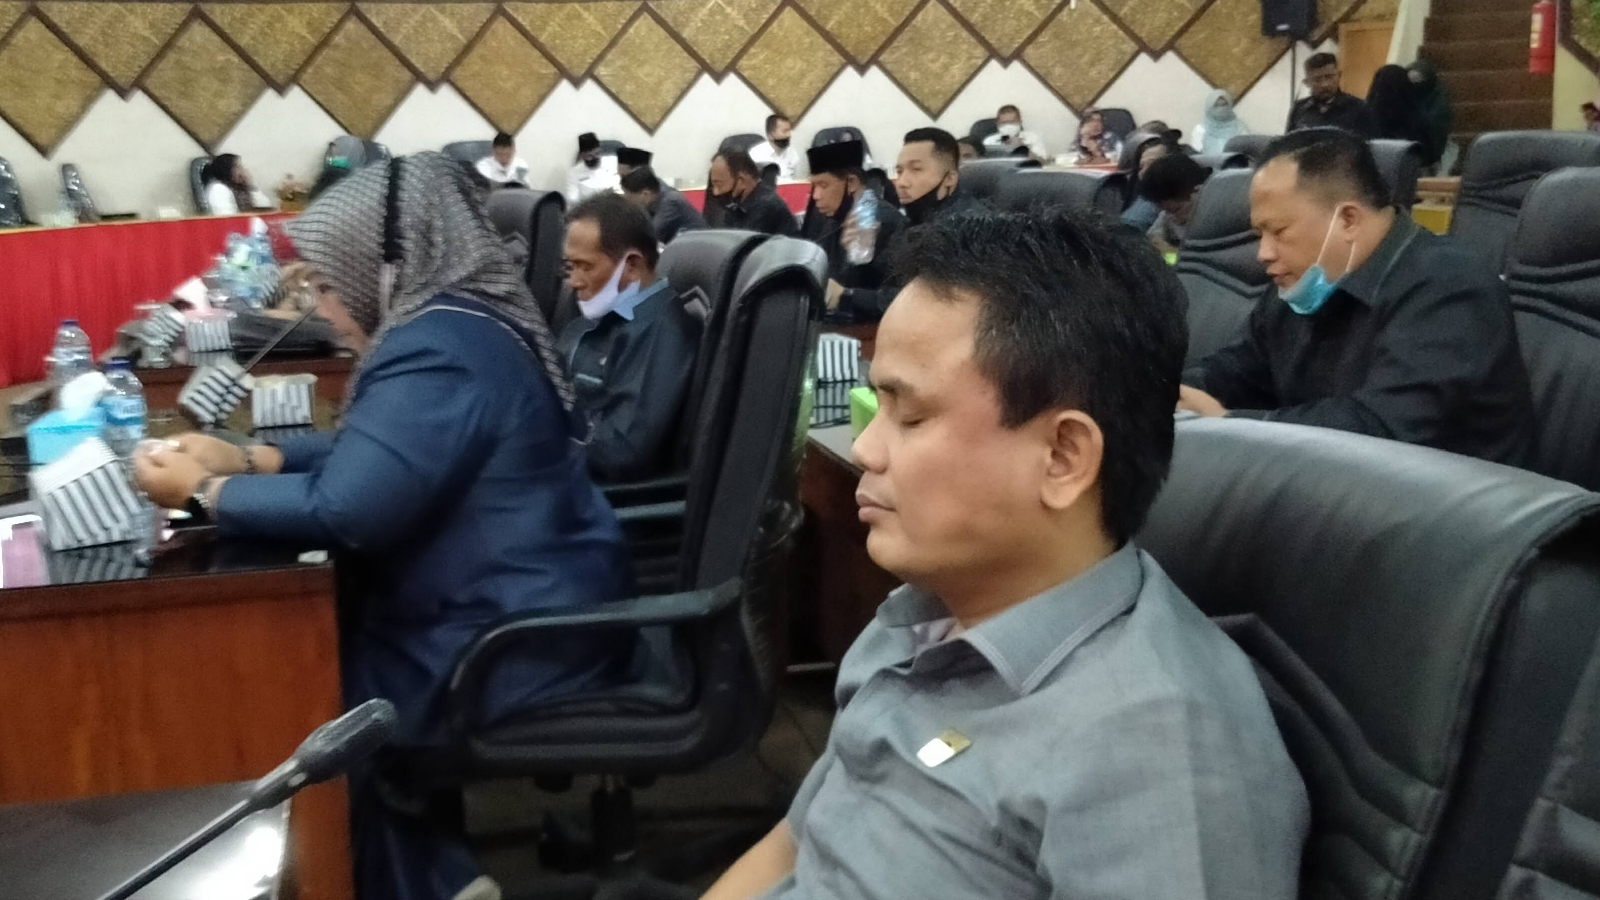 DPRD Kota Padang Gelar Rapat Paripurna, Wako Hendri Septa Sampaikan RAPBD 2022 Pendapatan Daerah Diperkirakan Rp2,597 Triliun